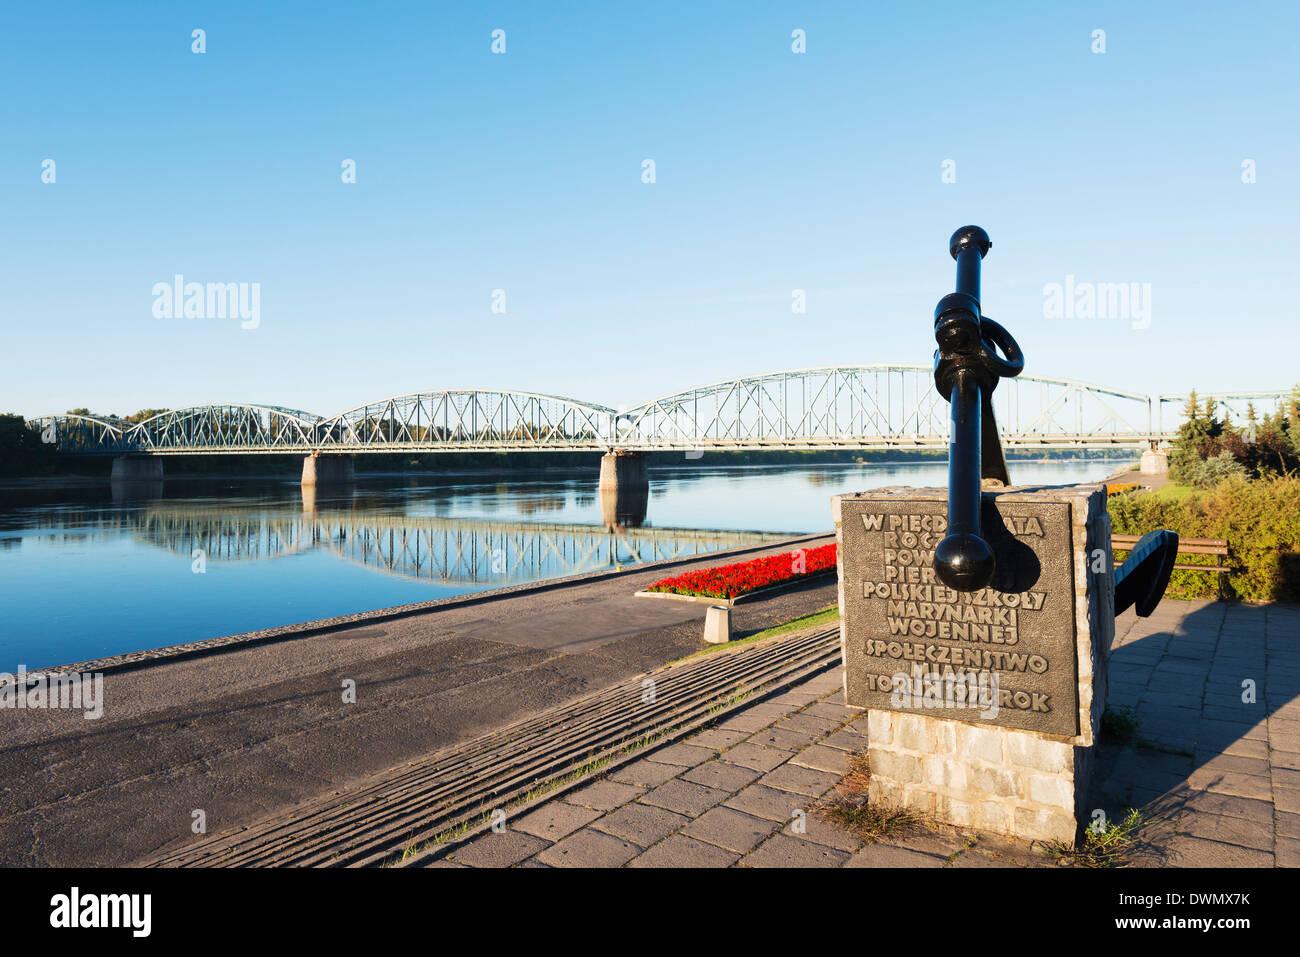 Vistula River, Torun, Gdansk and Pomerania, Poland, Europe - Stock Image